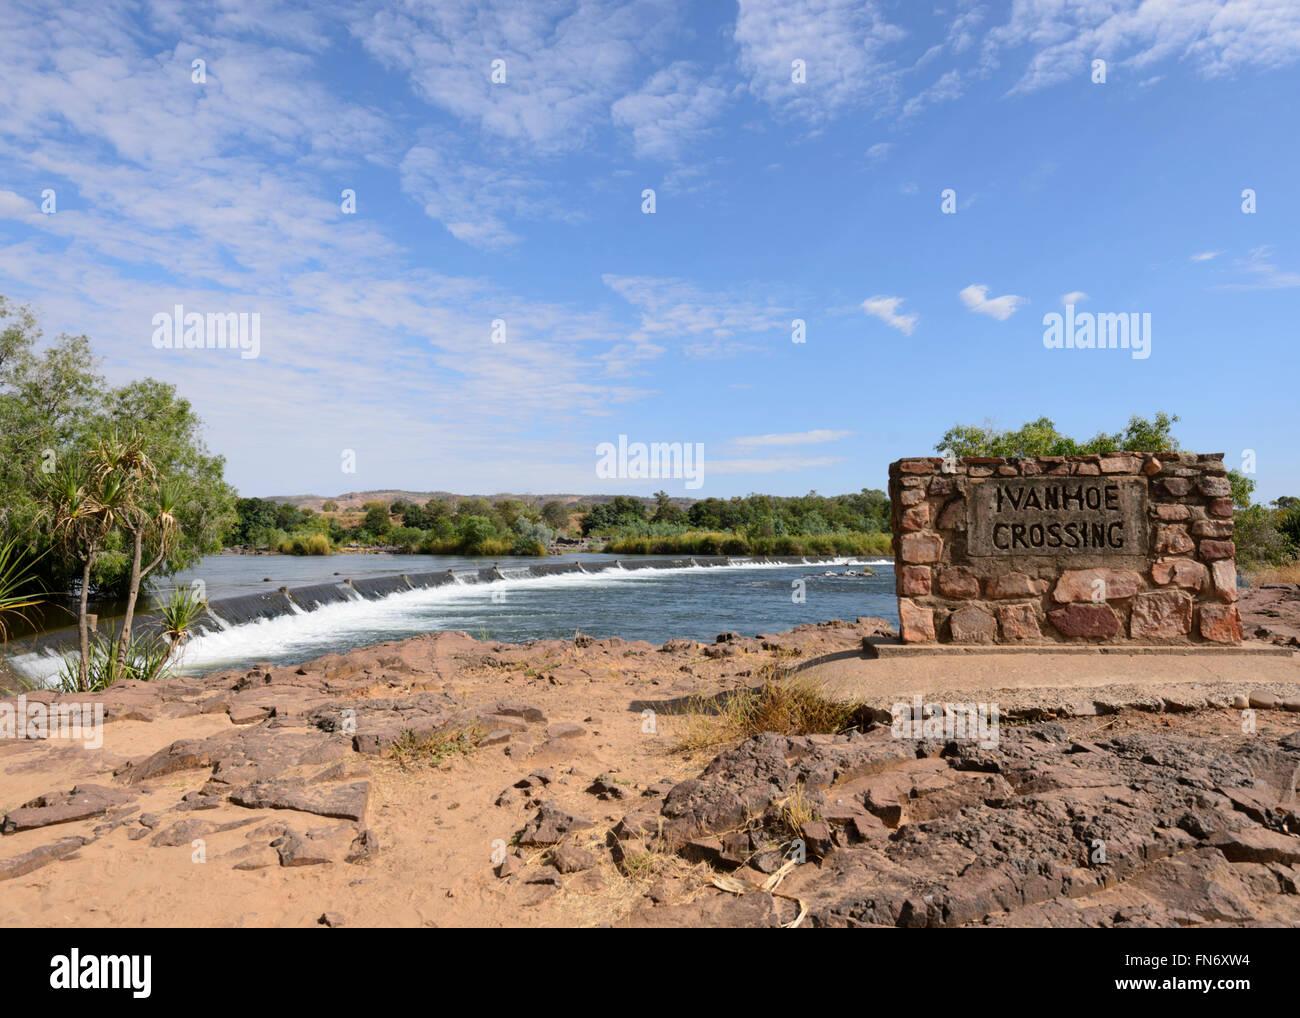 Ivanhoe Crossing, Ord River, Kununurra, Kimberley Region, Western Australia - Stock Image